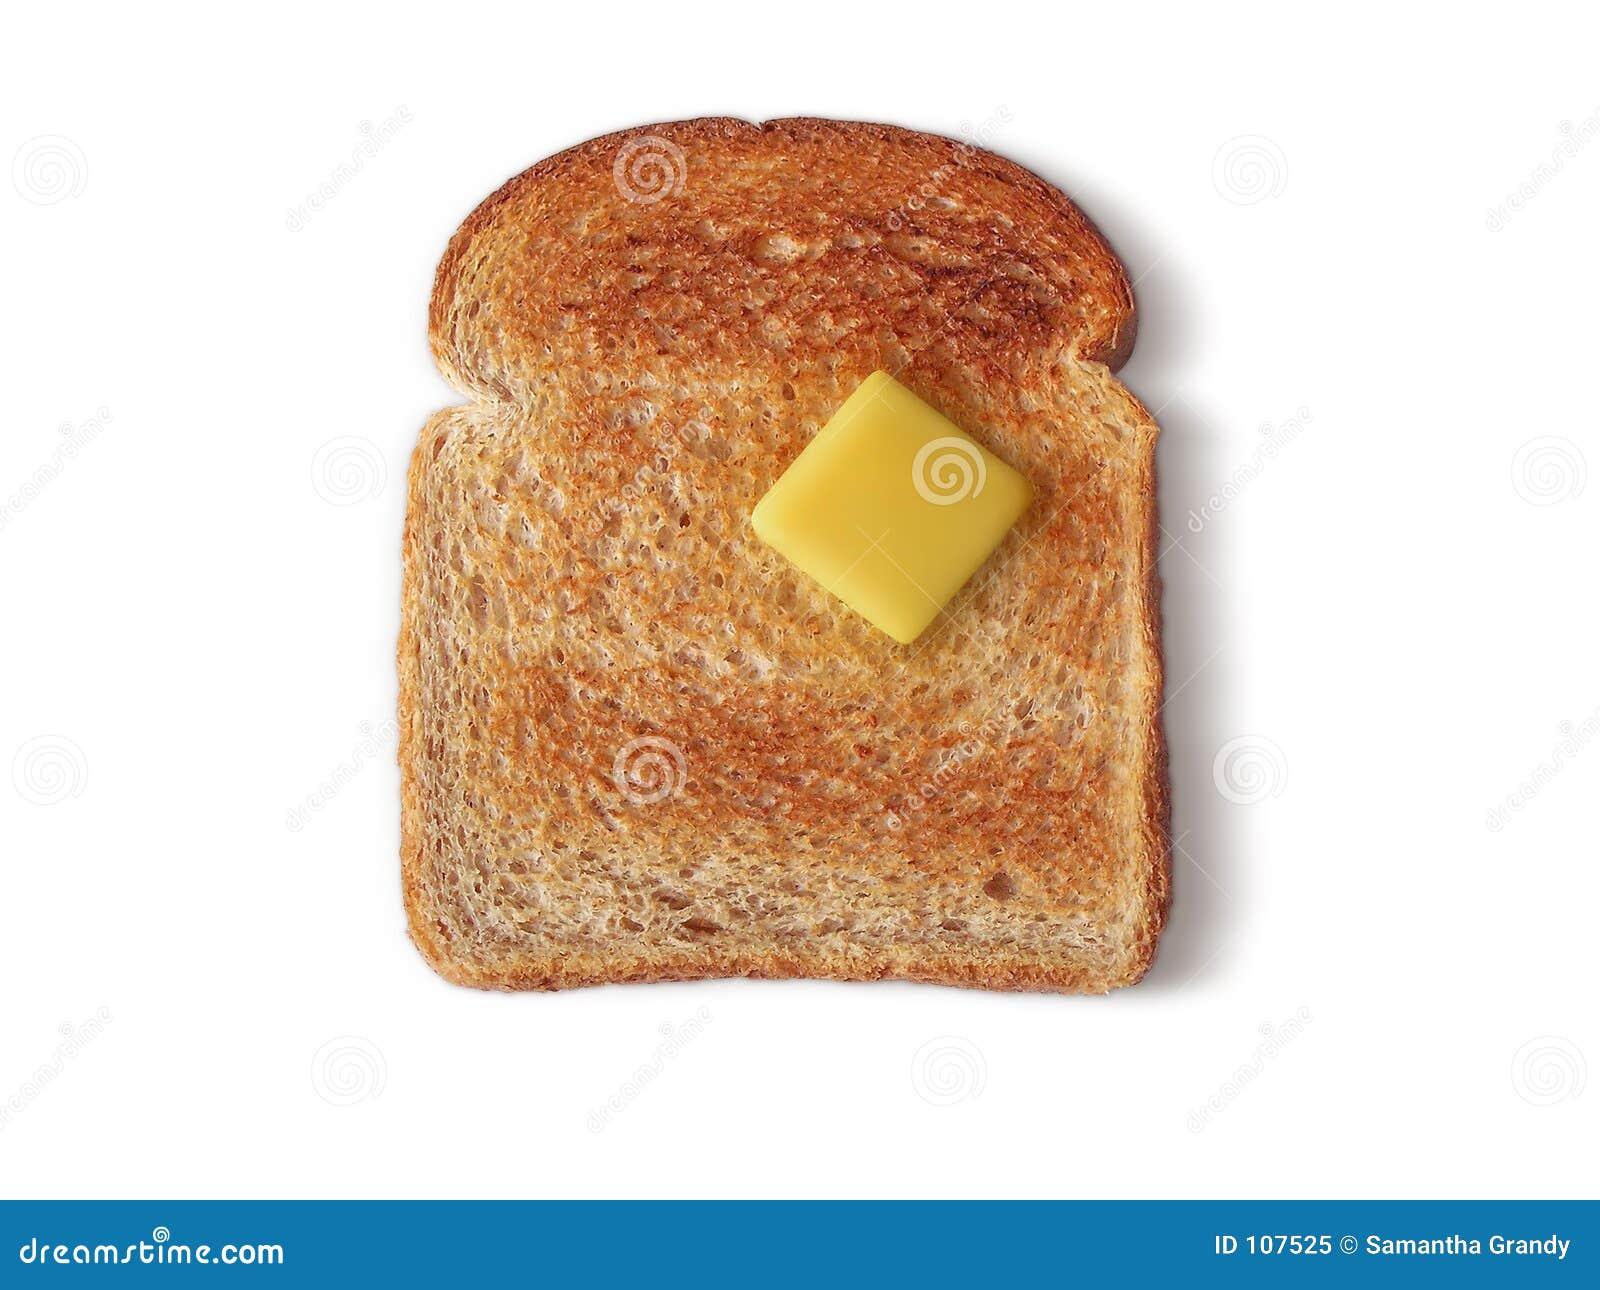 Brot: Geröstet zur Verkollkommnung (Pfad eingeschlossen)